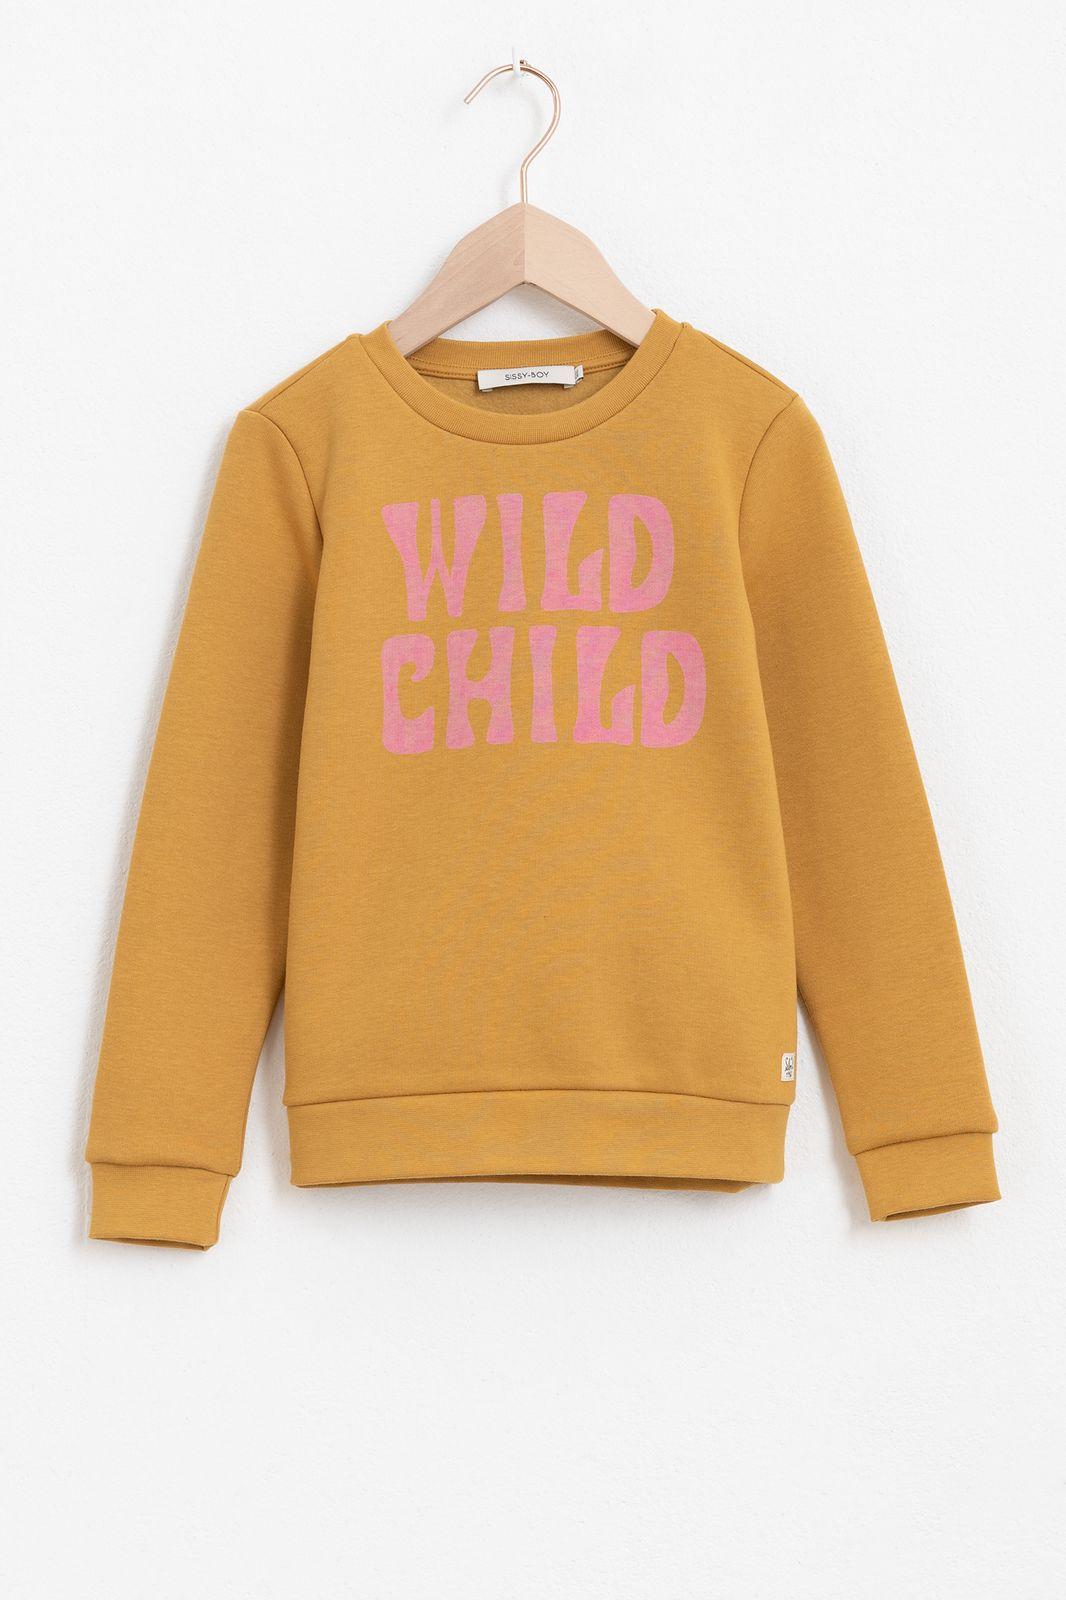 Okergele sweater met tekst